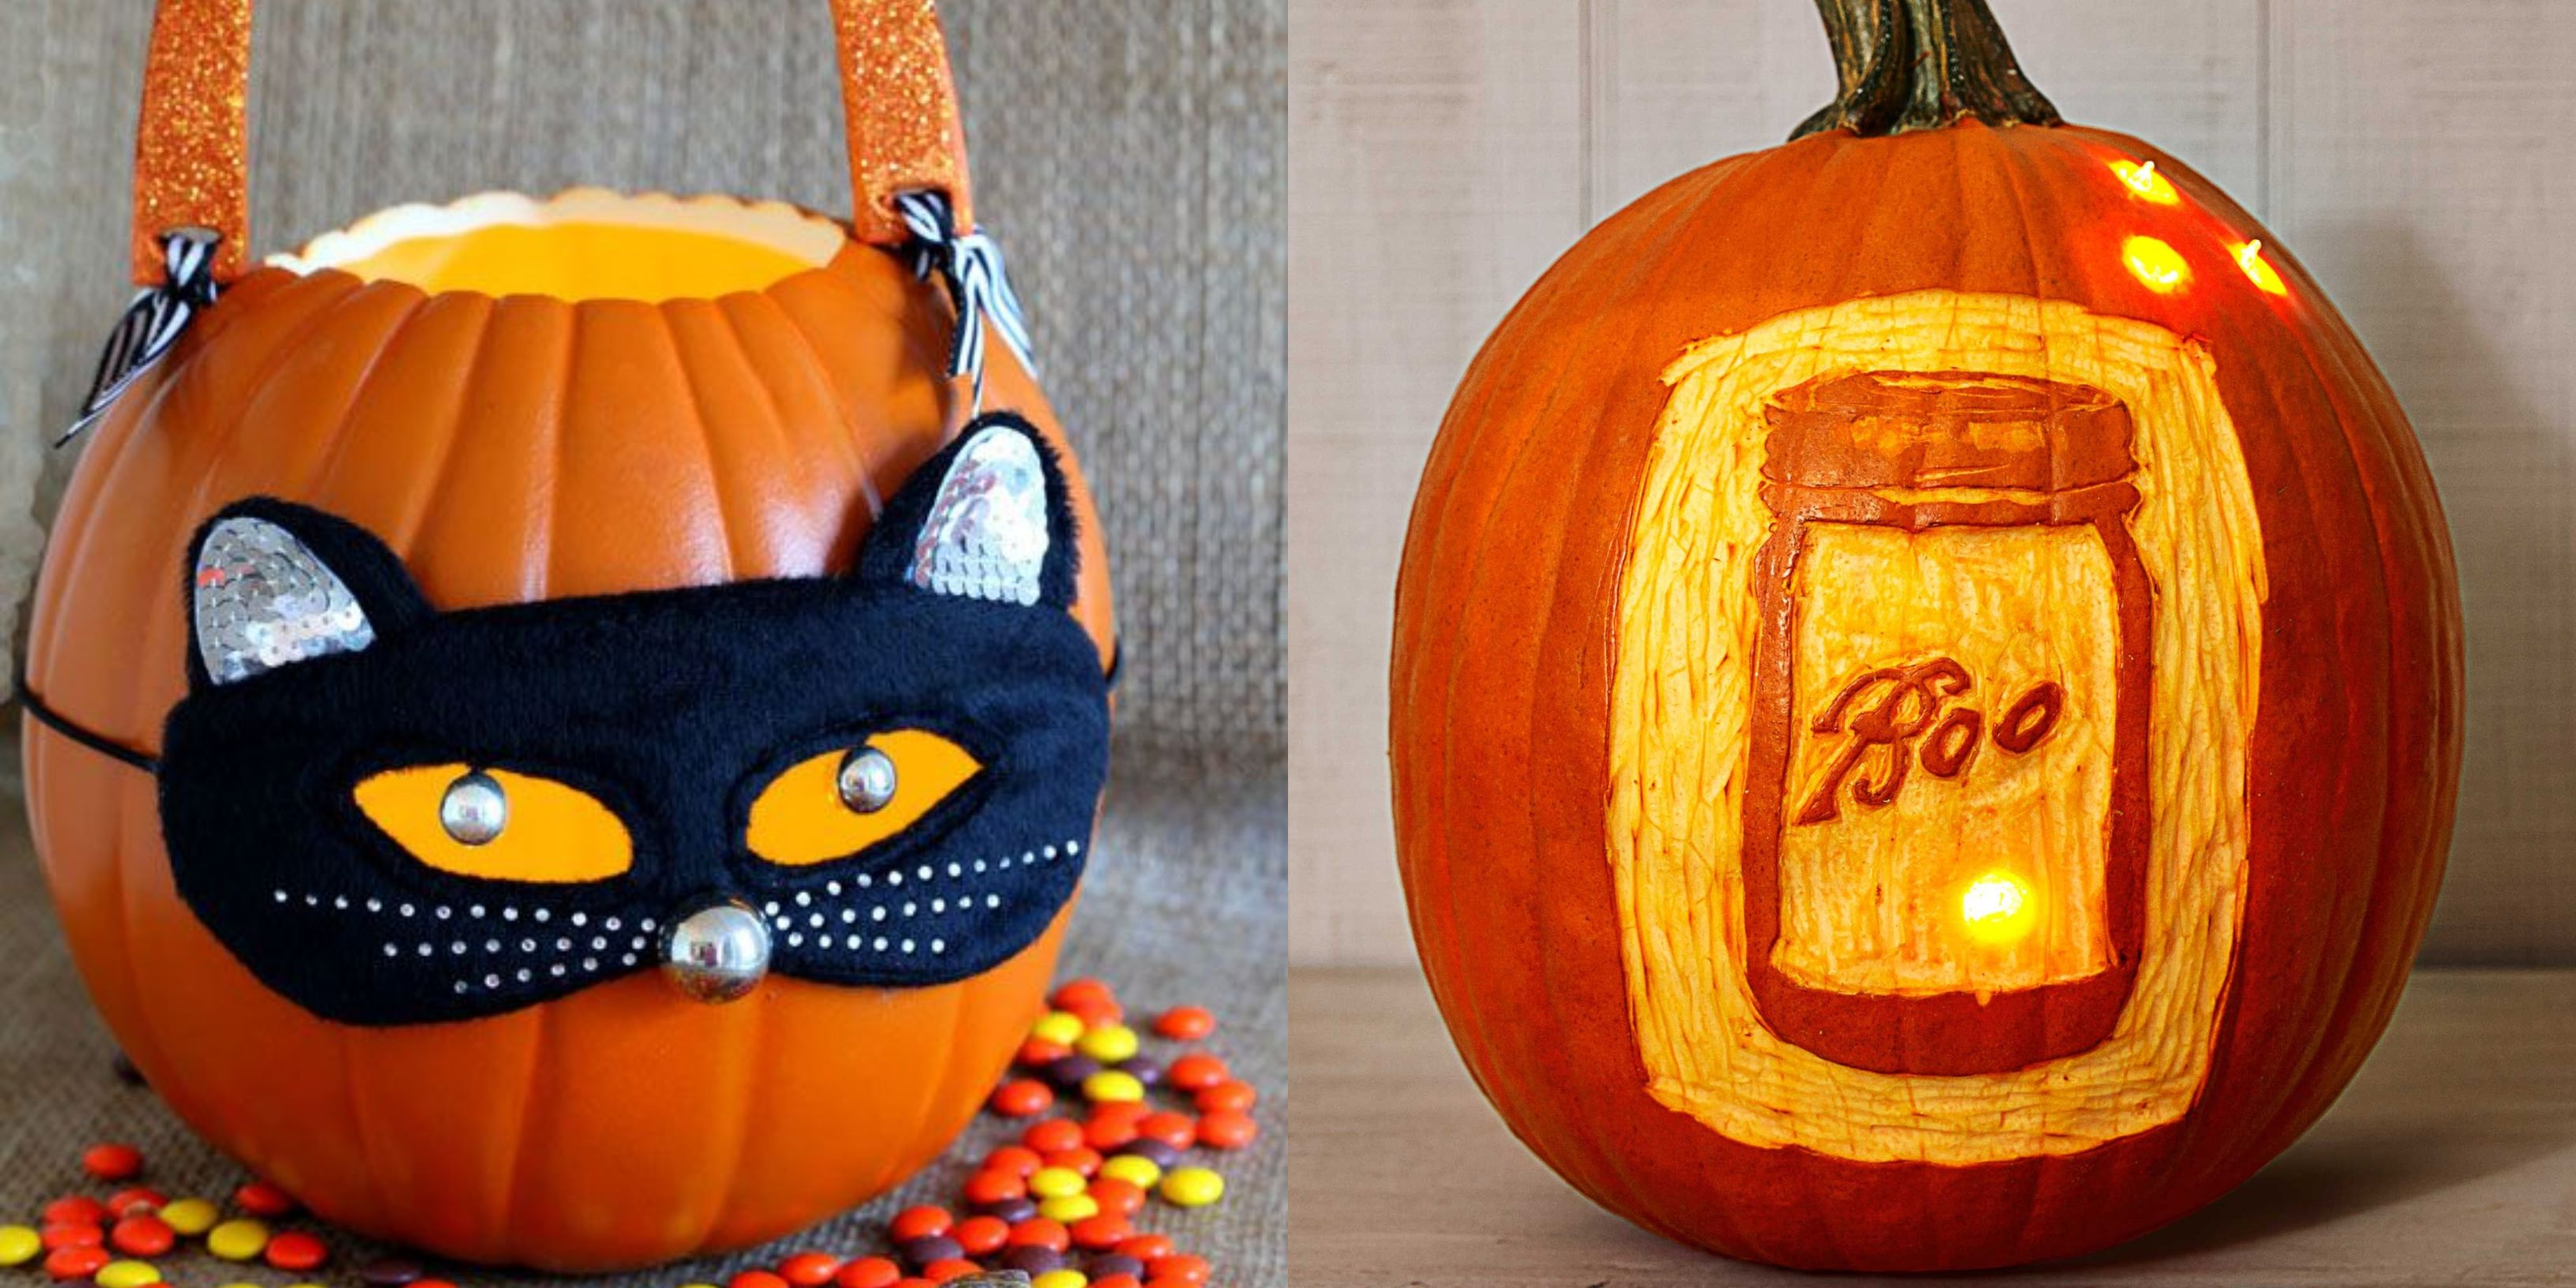 56 Pumpkin Carving Ideas That Put Regular Old Jack-o'-Lanterns to Shame